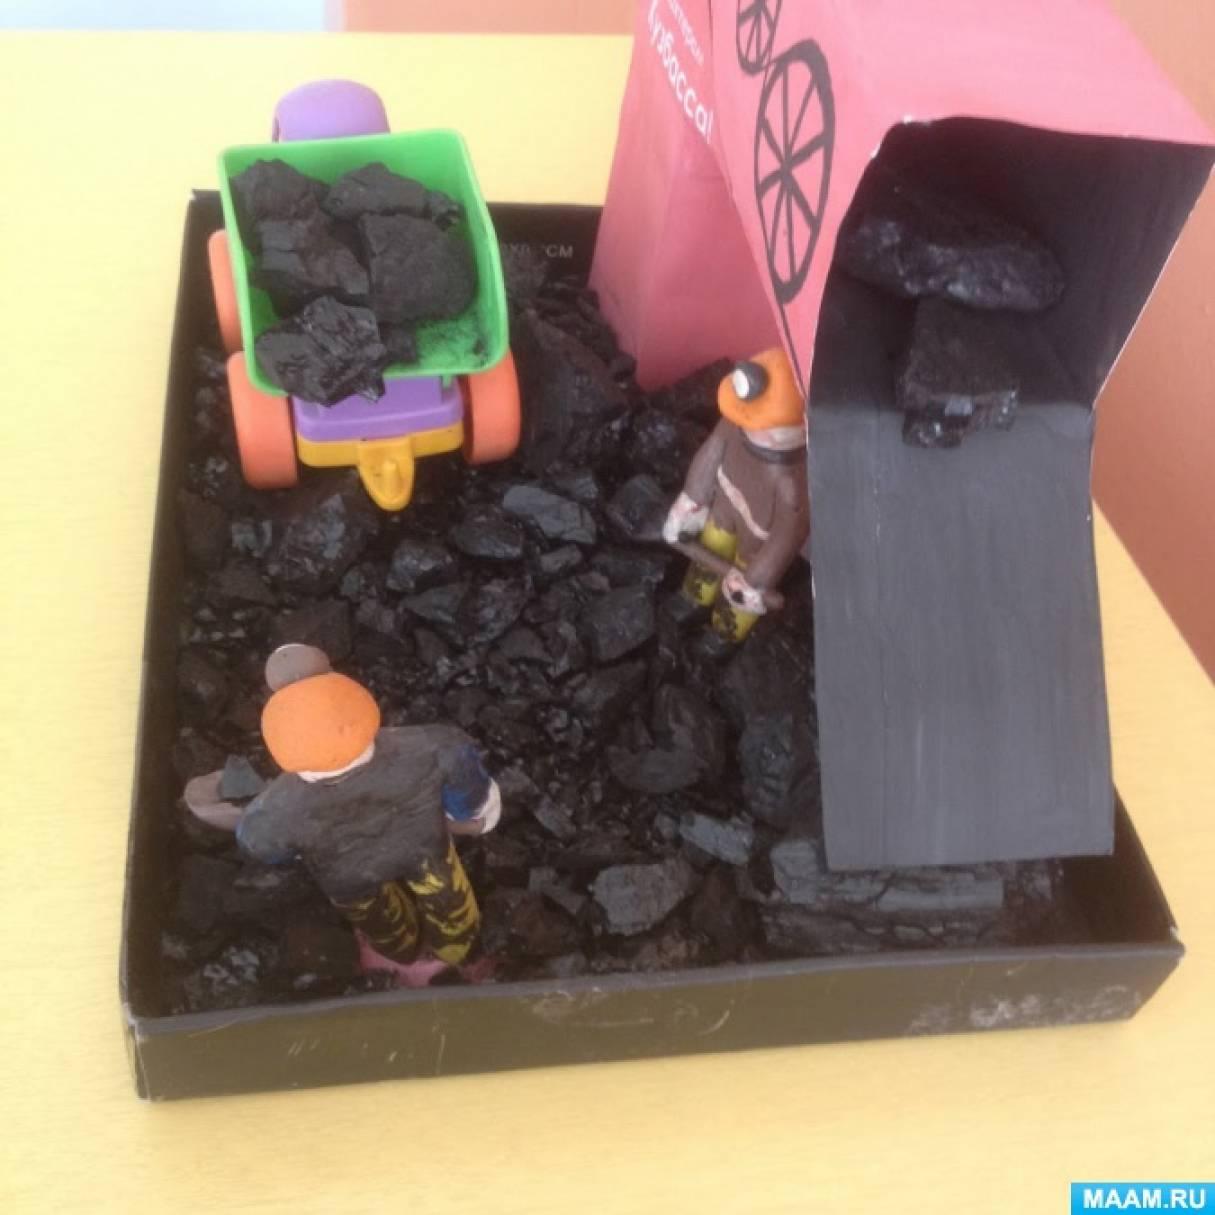 Поделки ко дню шахтера из пластилина 5